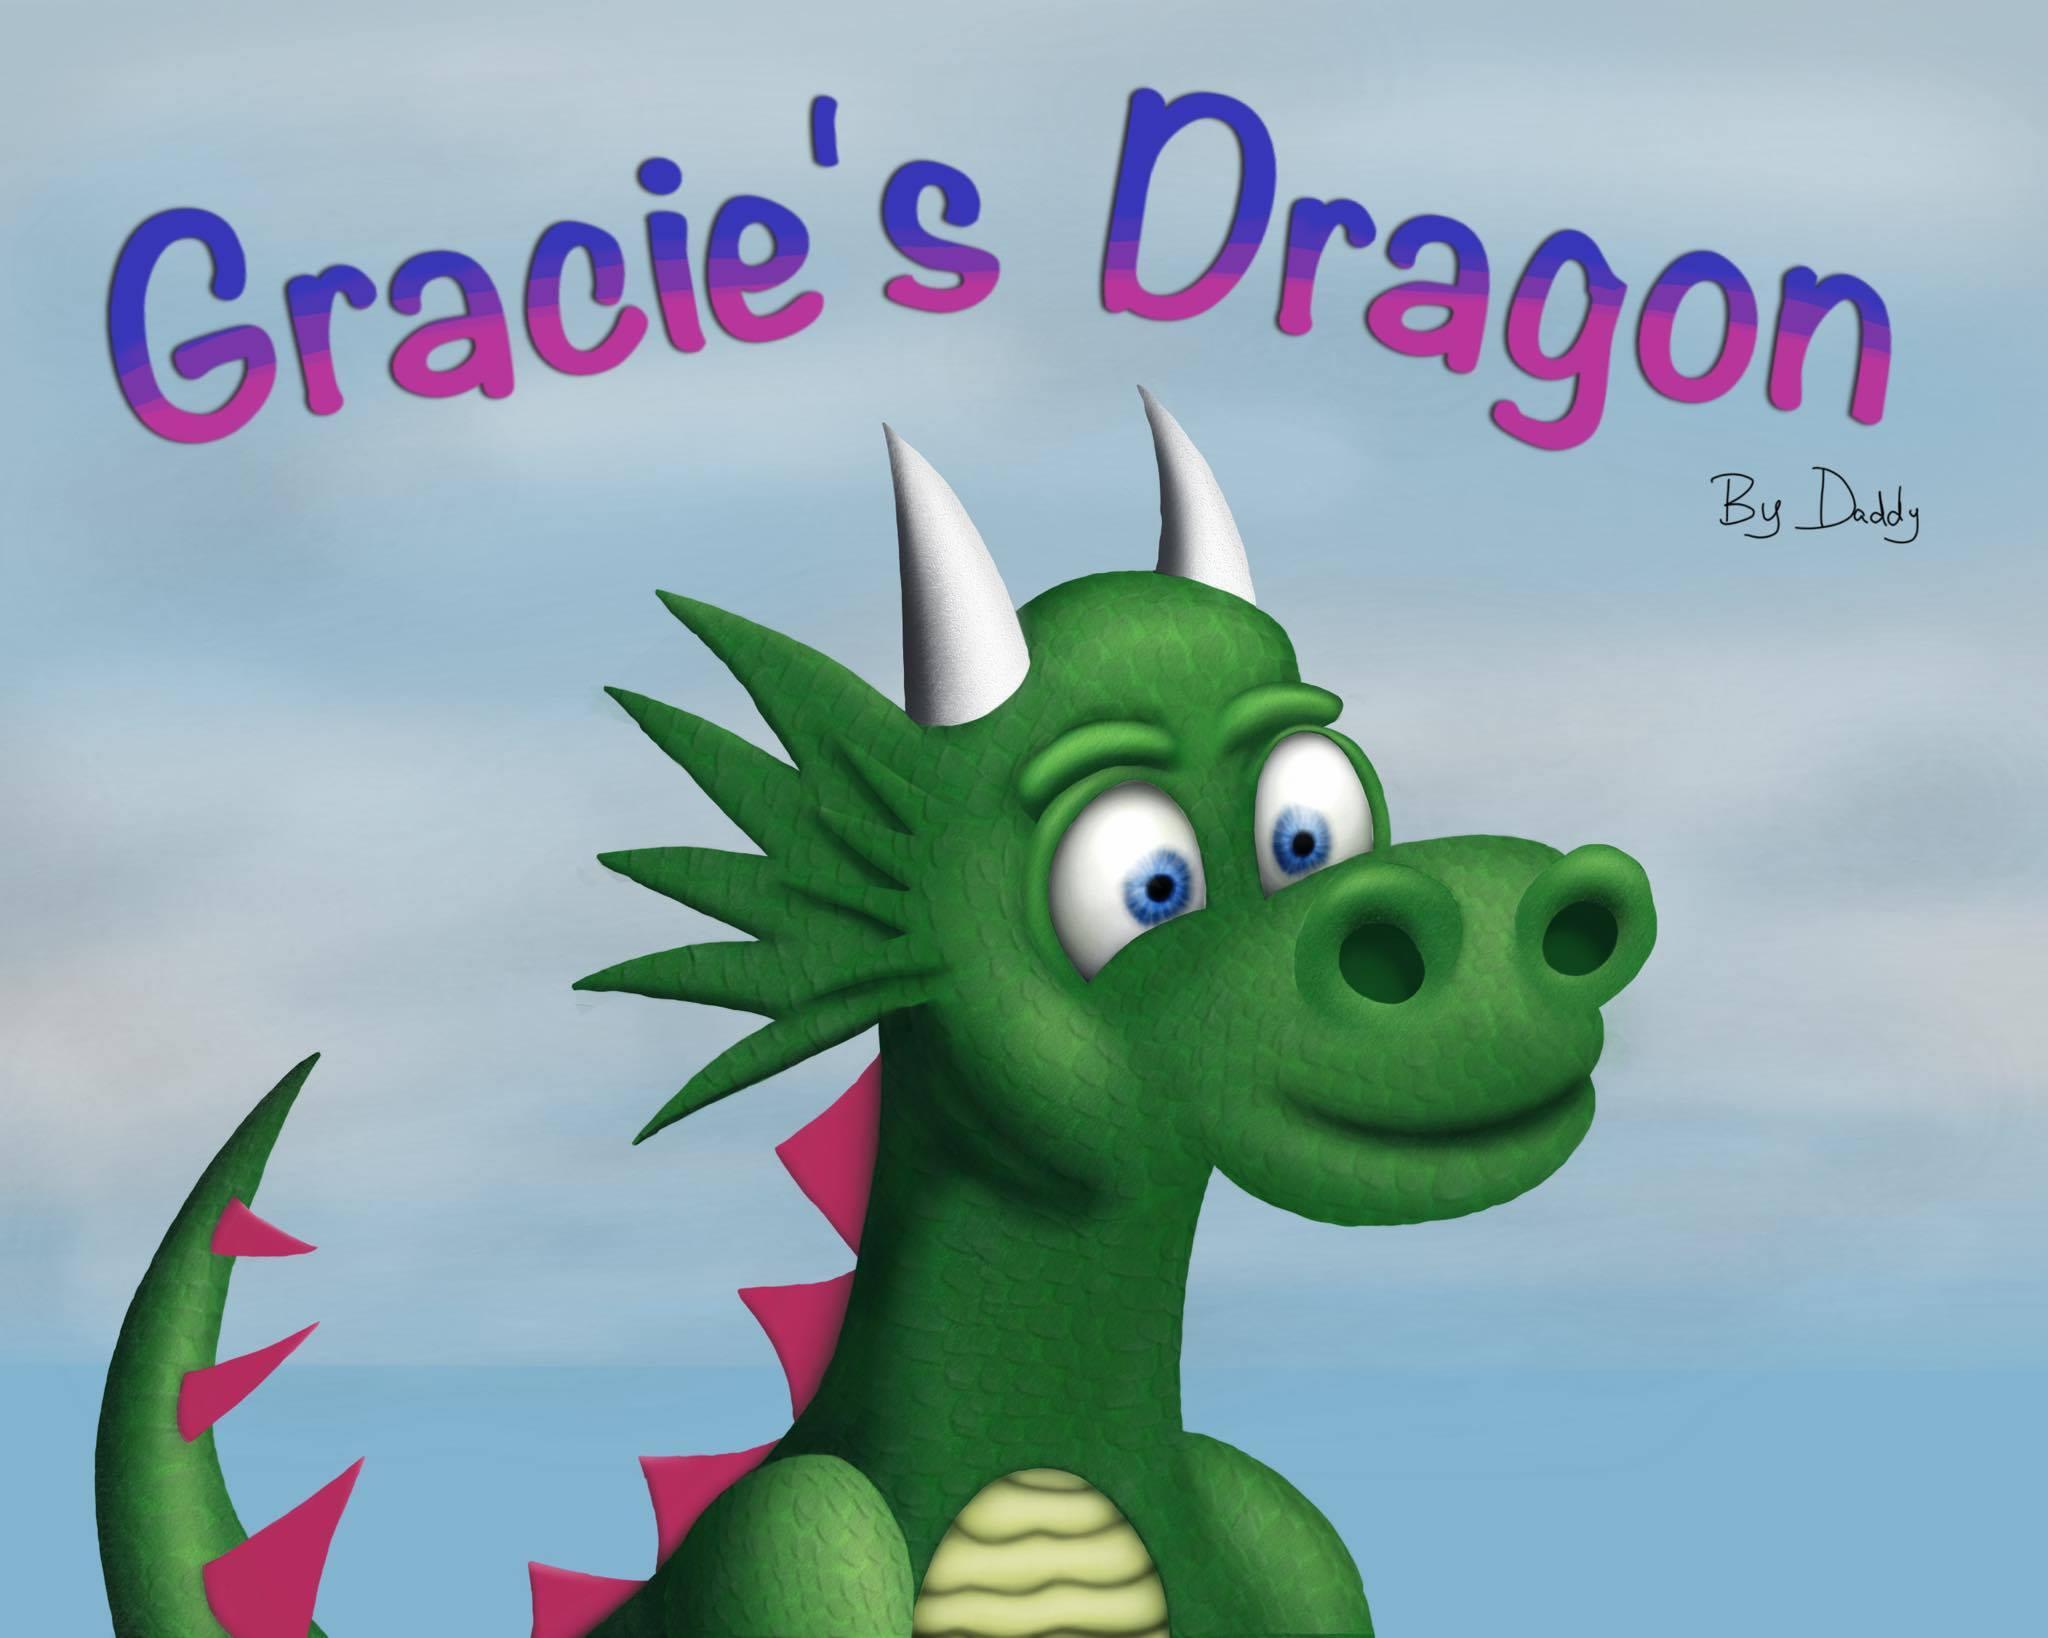 Gracie's Dragon